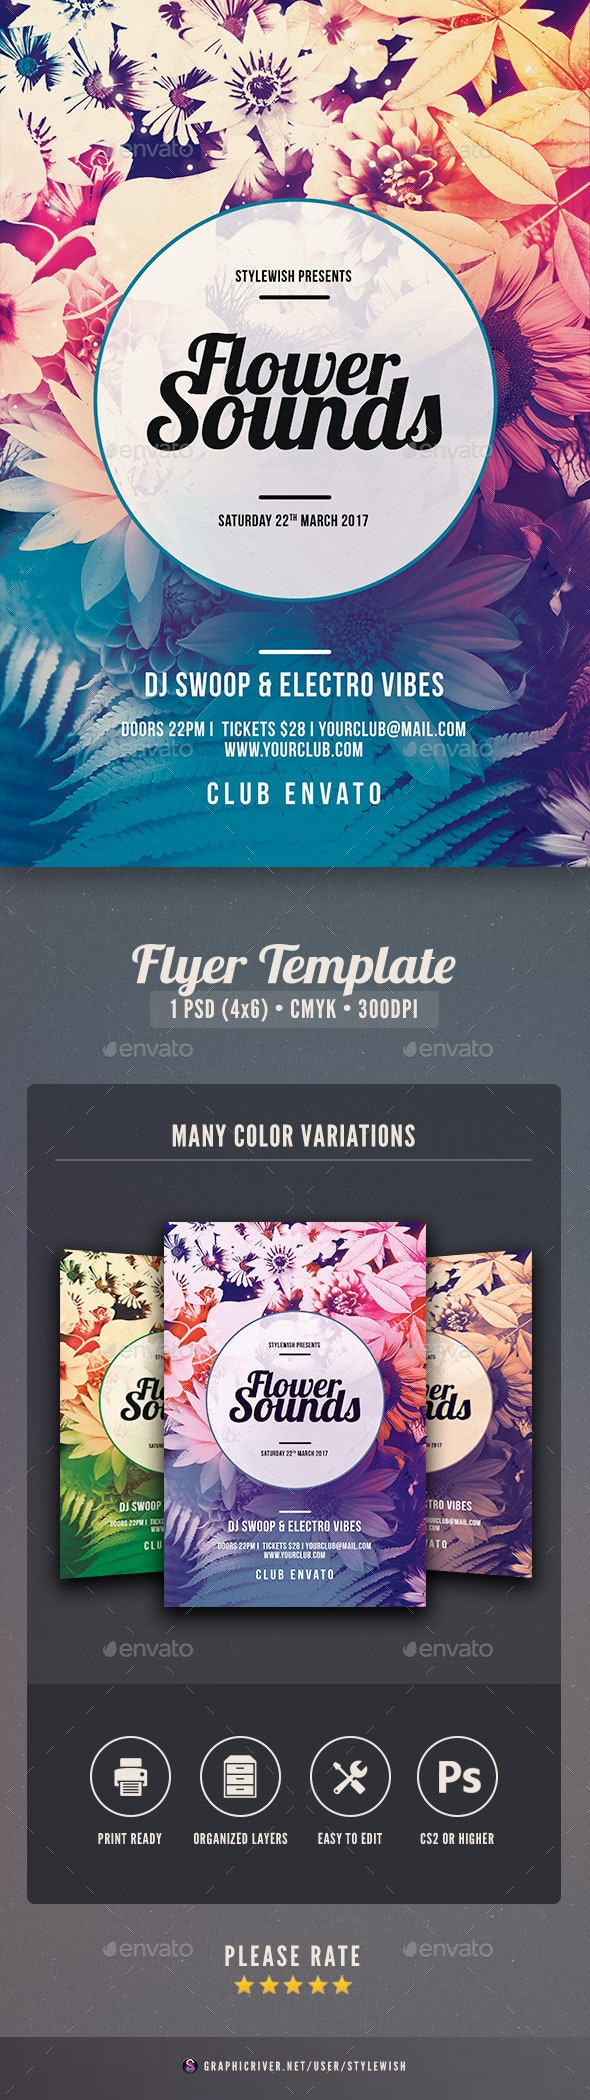 Flower Sounds Flyer - Clubs & Parties Events